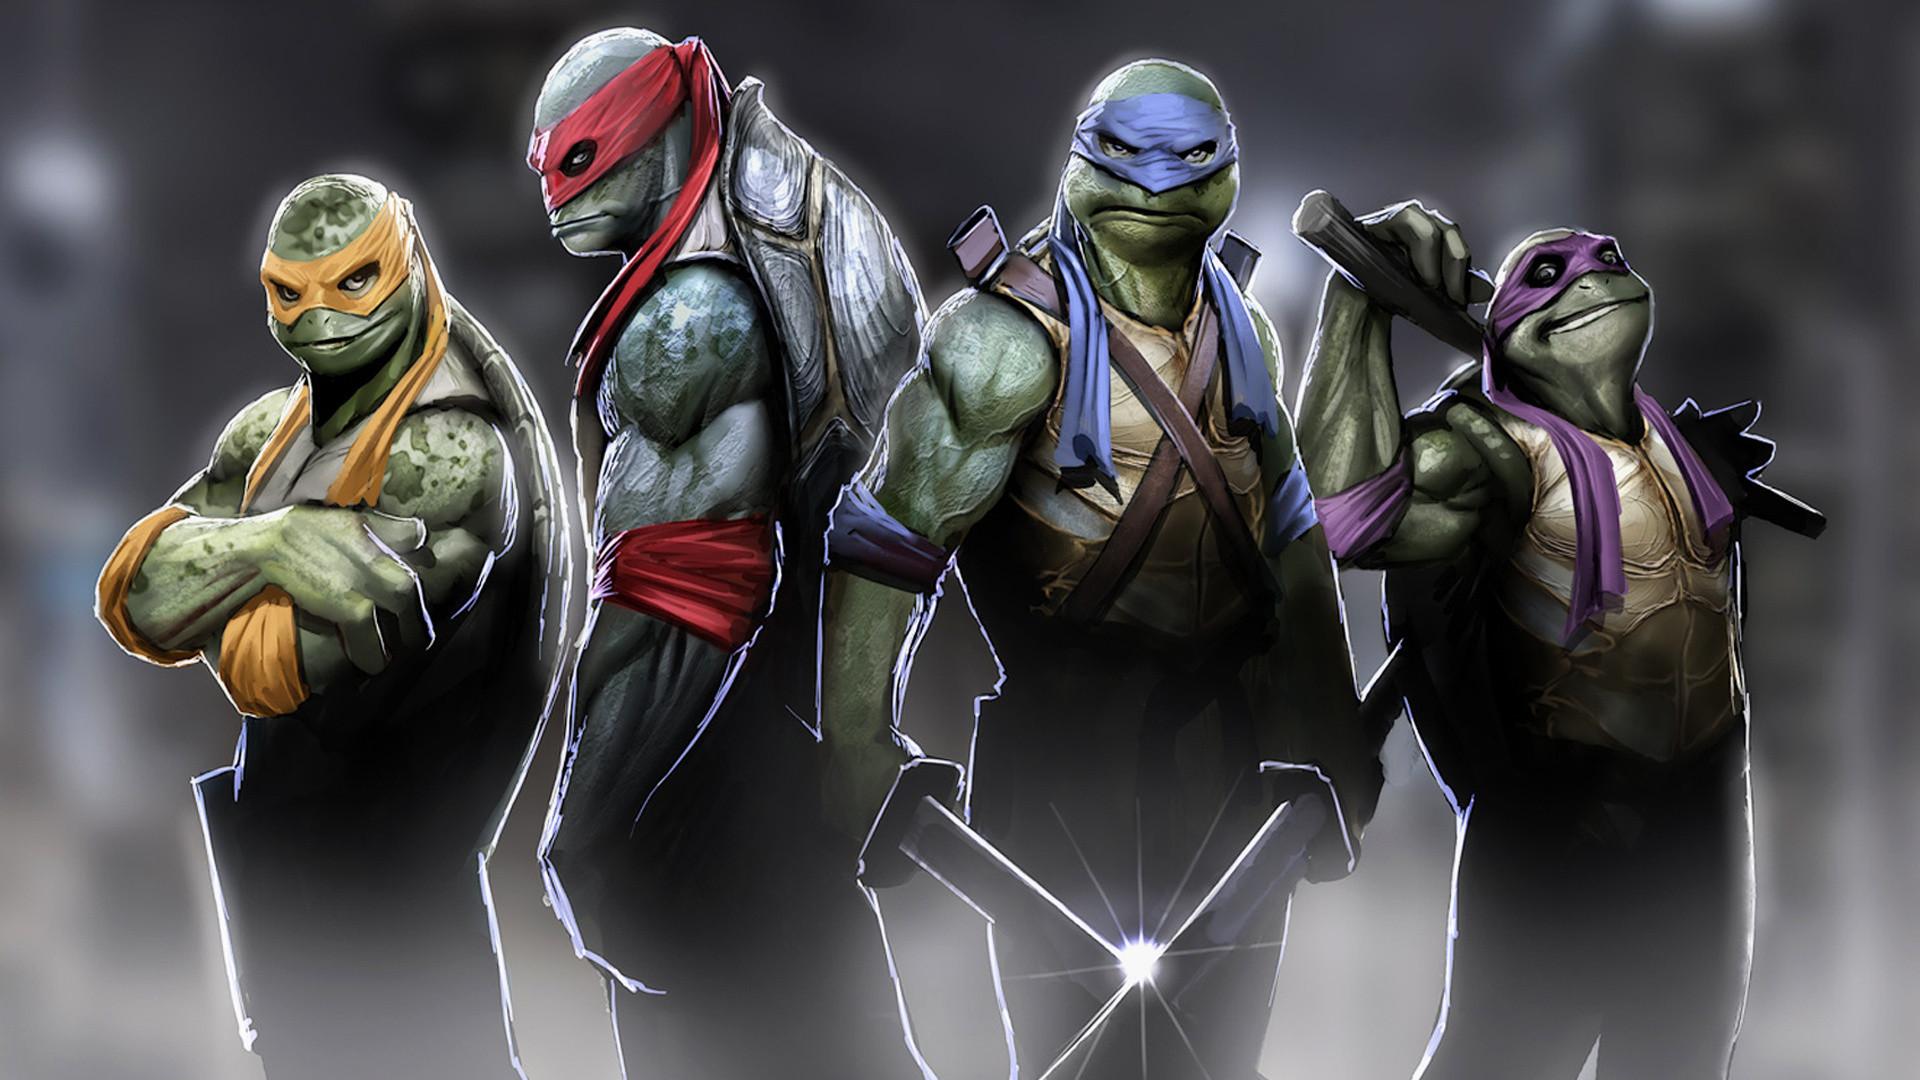 Res: 1920x1080, 6. teenage-mutant-ninja-turtles-wallpapers6-600x338